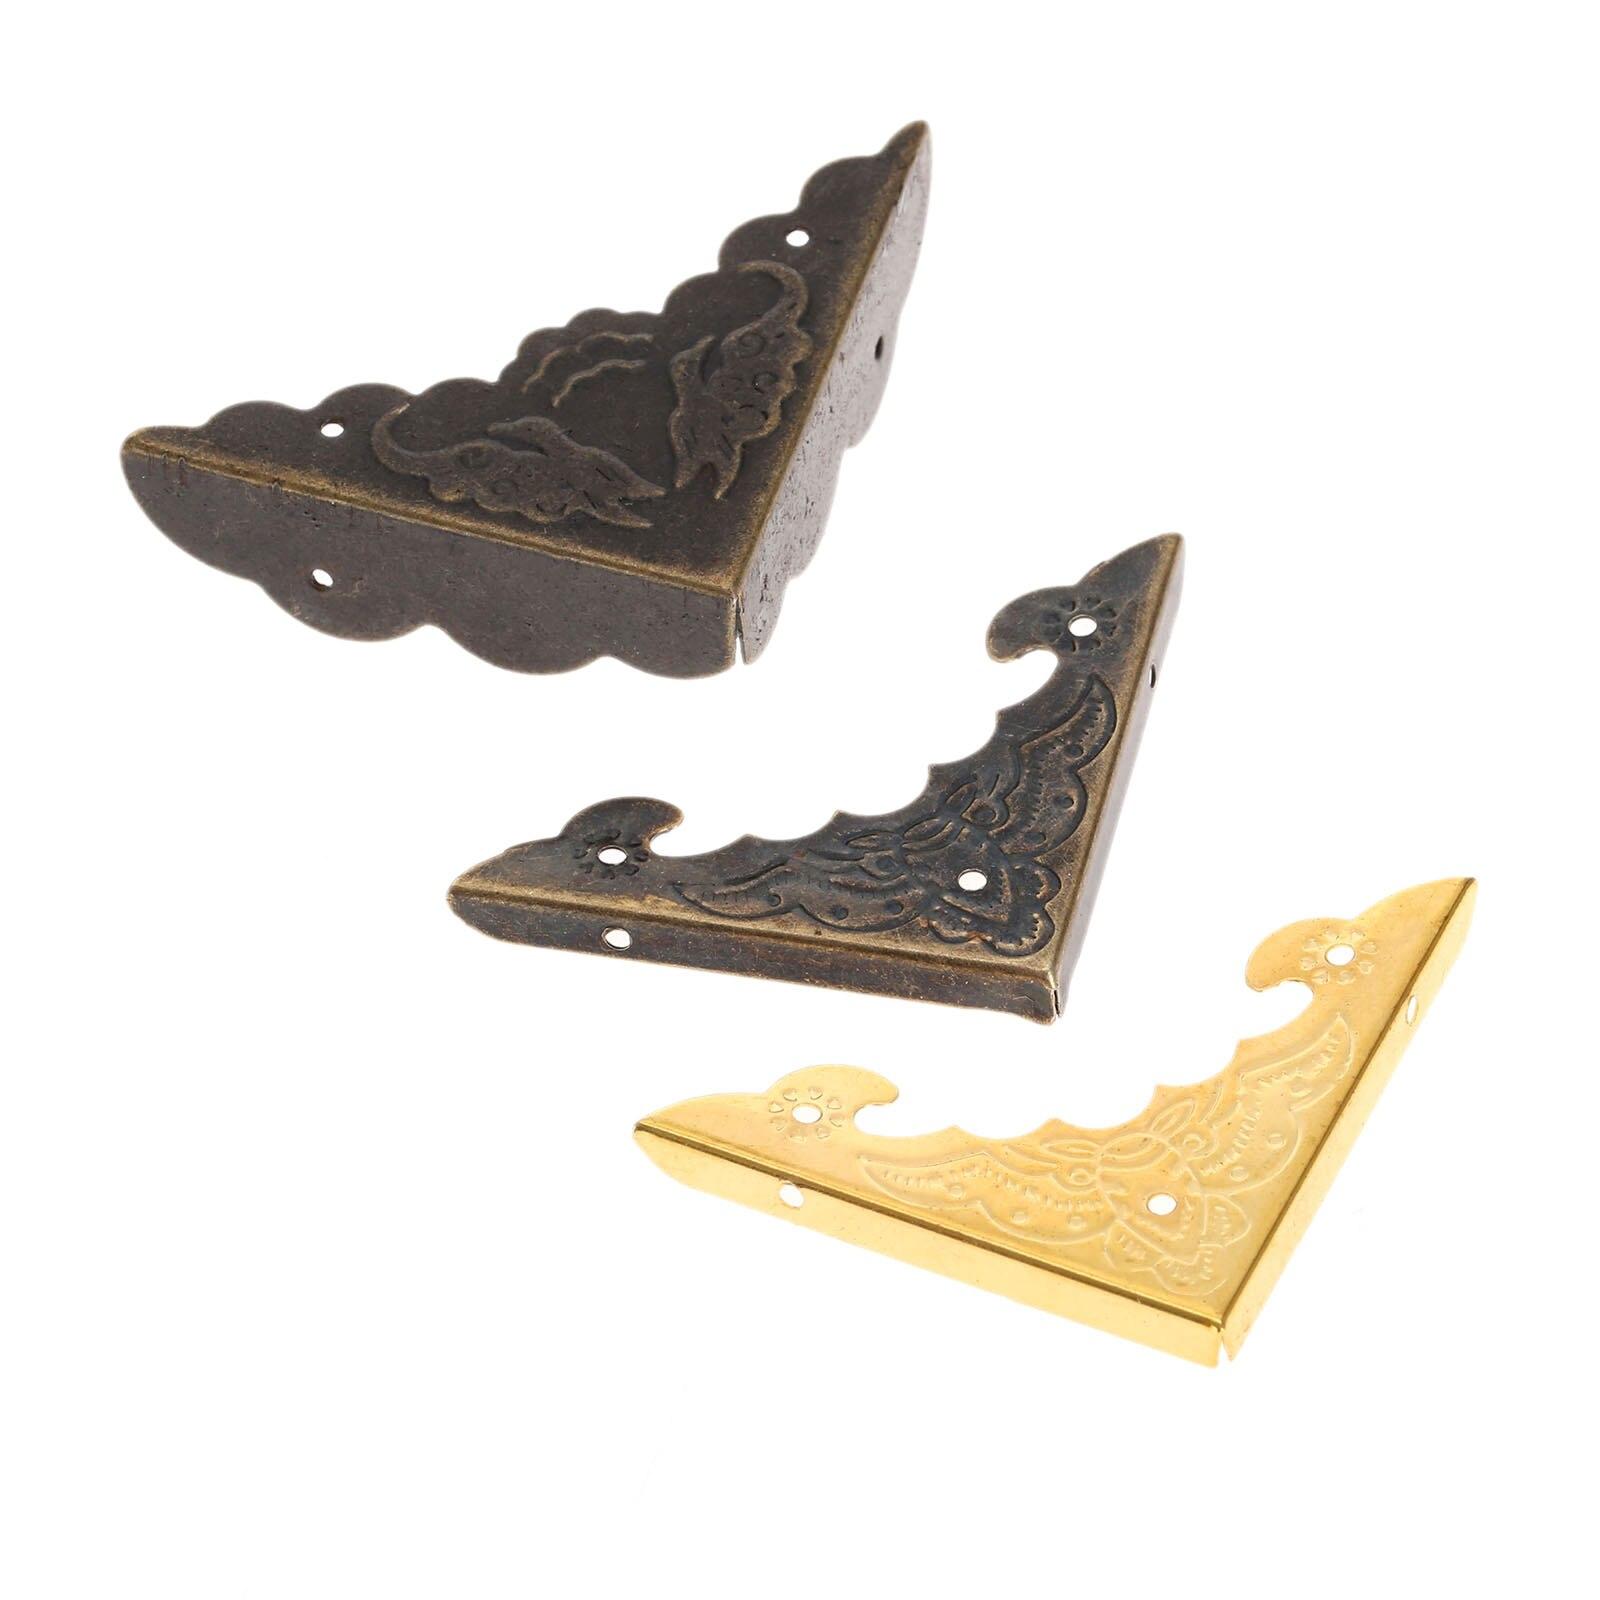 12Pcs Iron Book Scrapbooking Albums Corner Bracket Antique Brass/Gold Decorative Protectors Crafts For Furniture Hardware